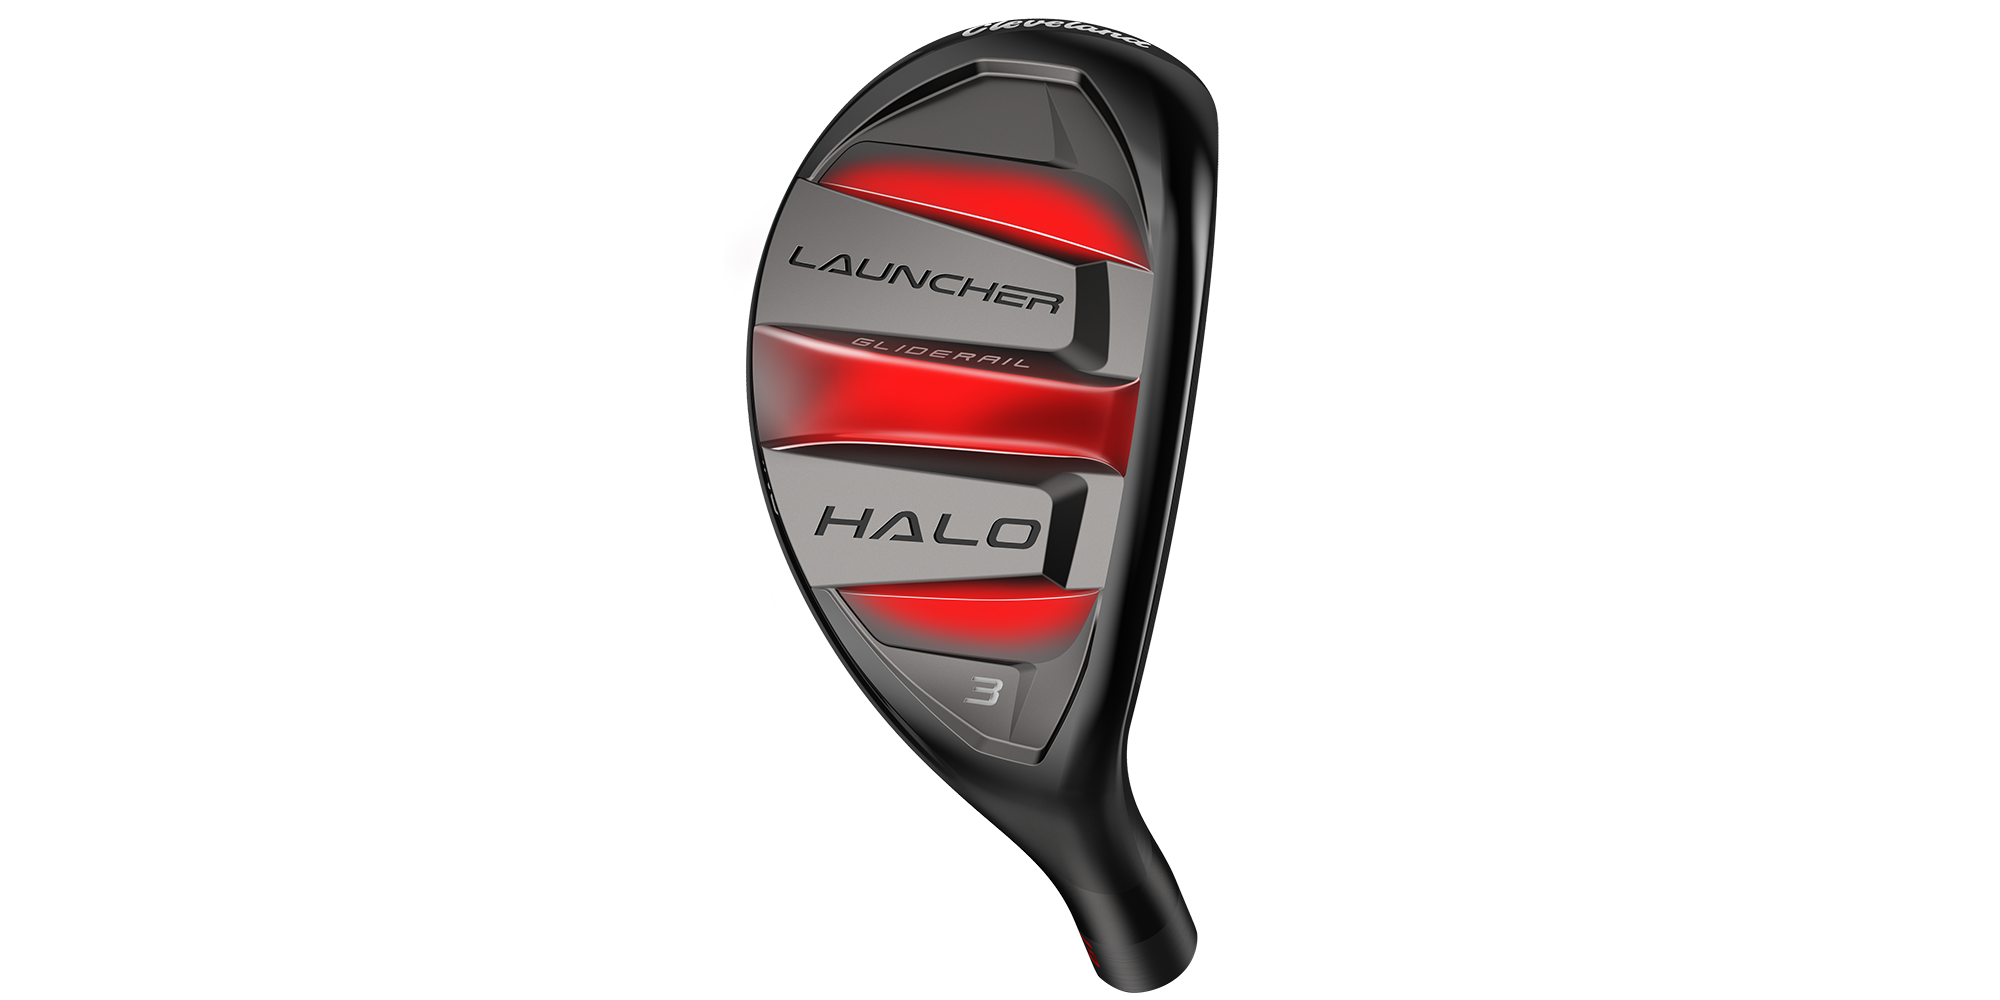 Cleveland HB Halo Hybrids GlideRails